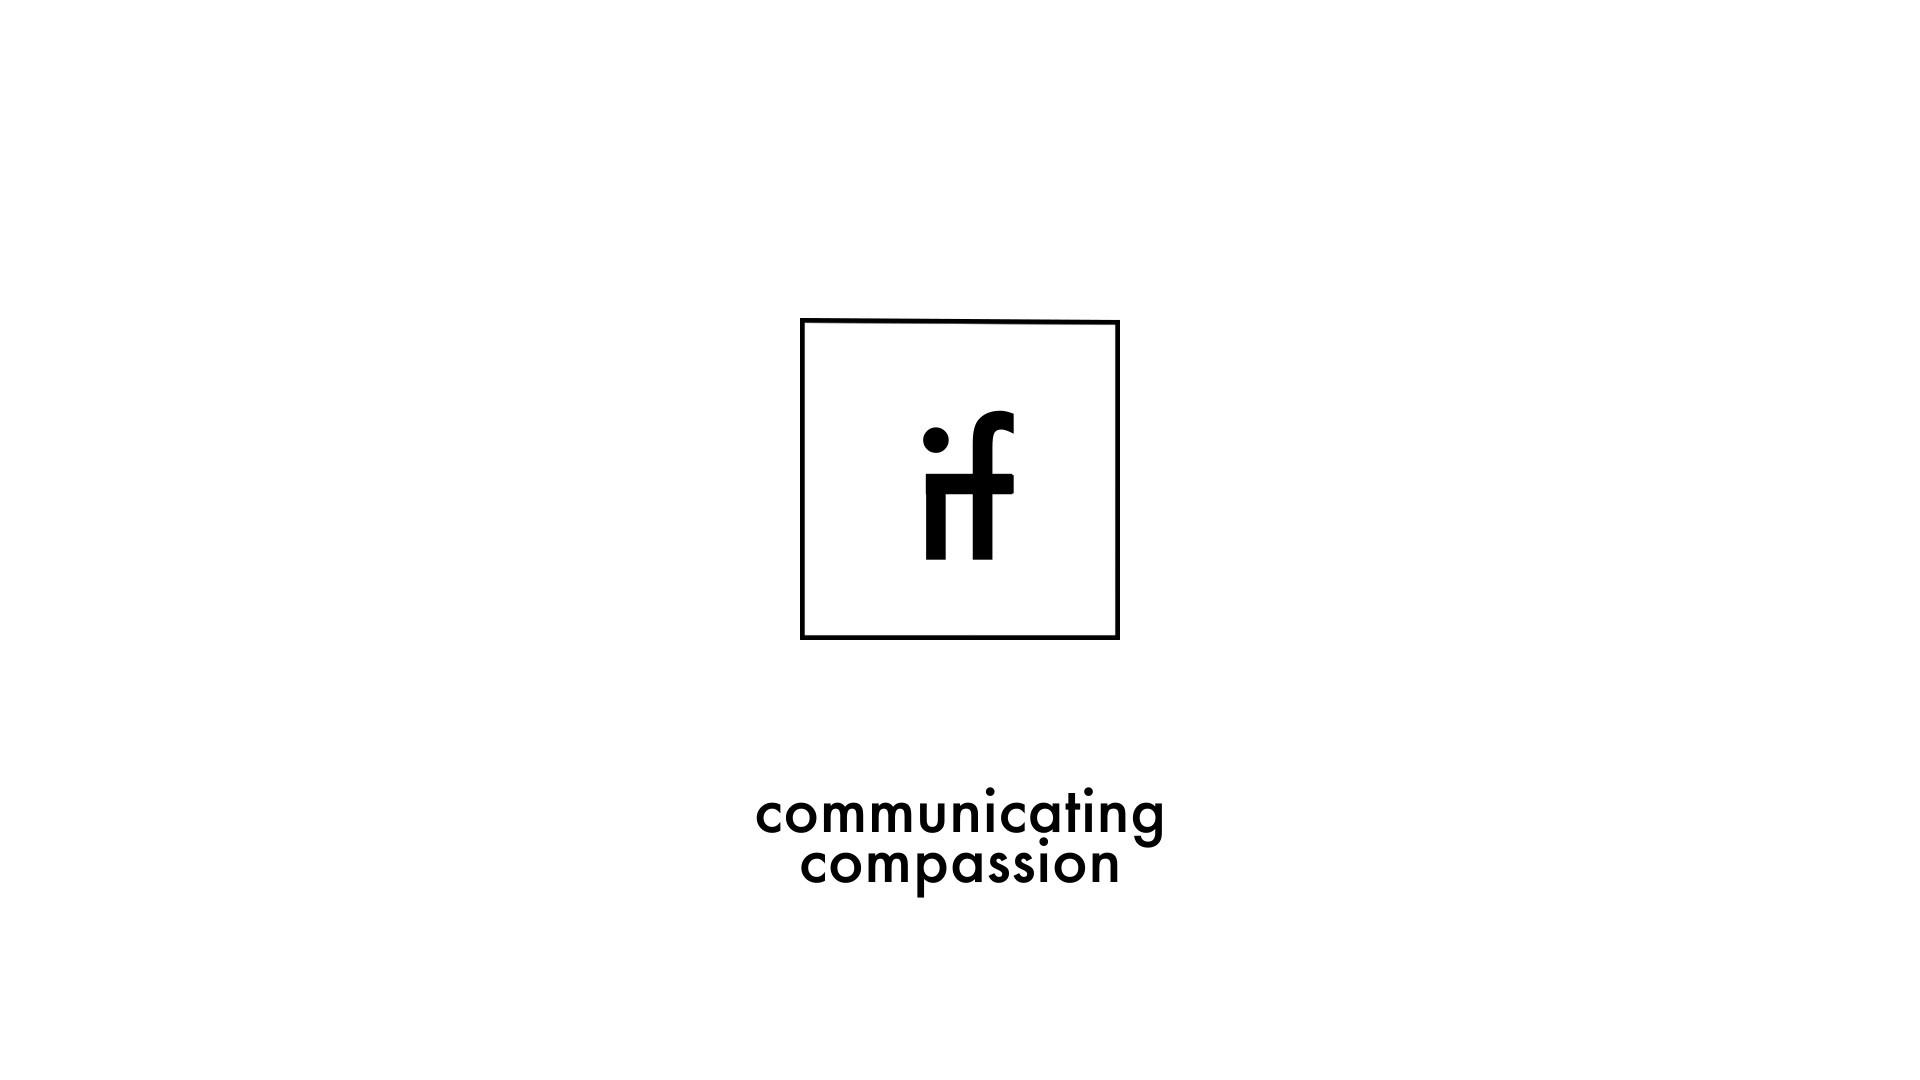 IF moving logo [no sound]_1.mp4